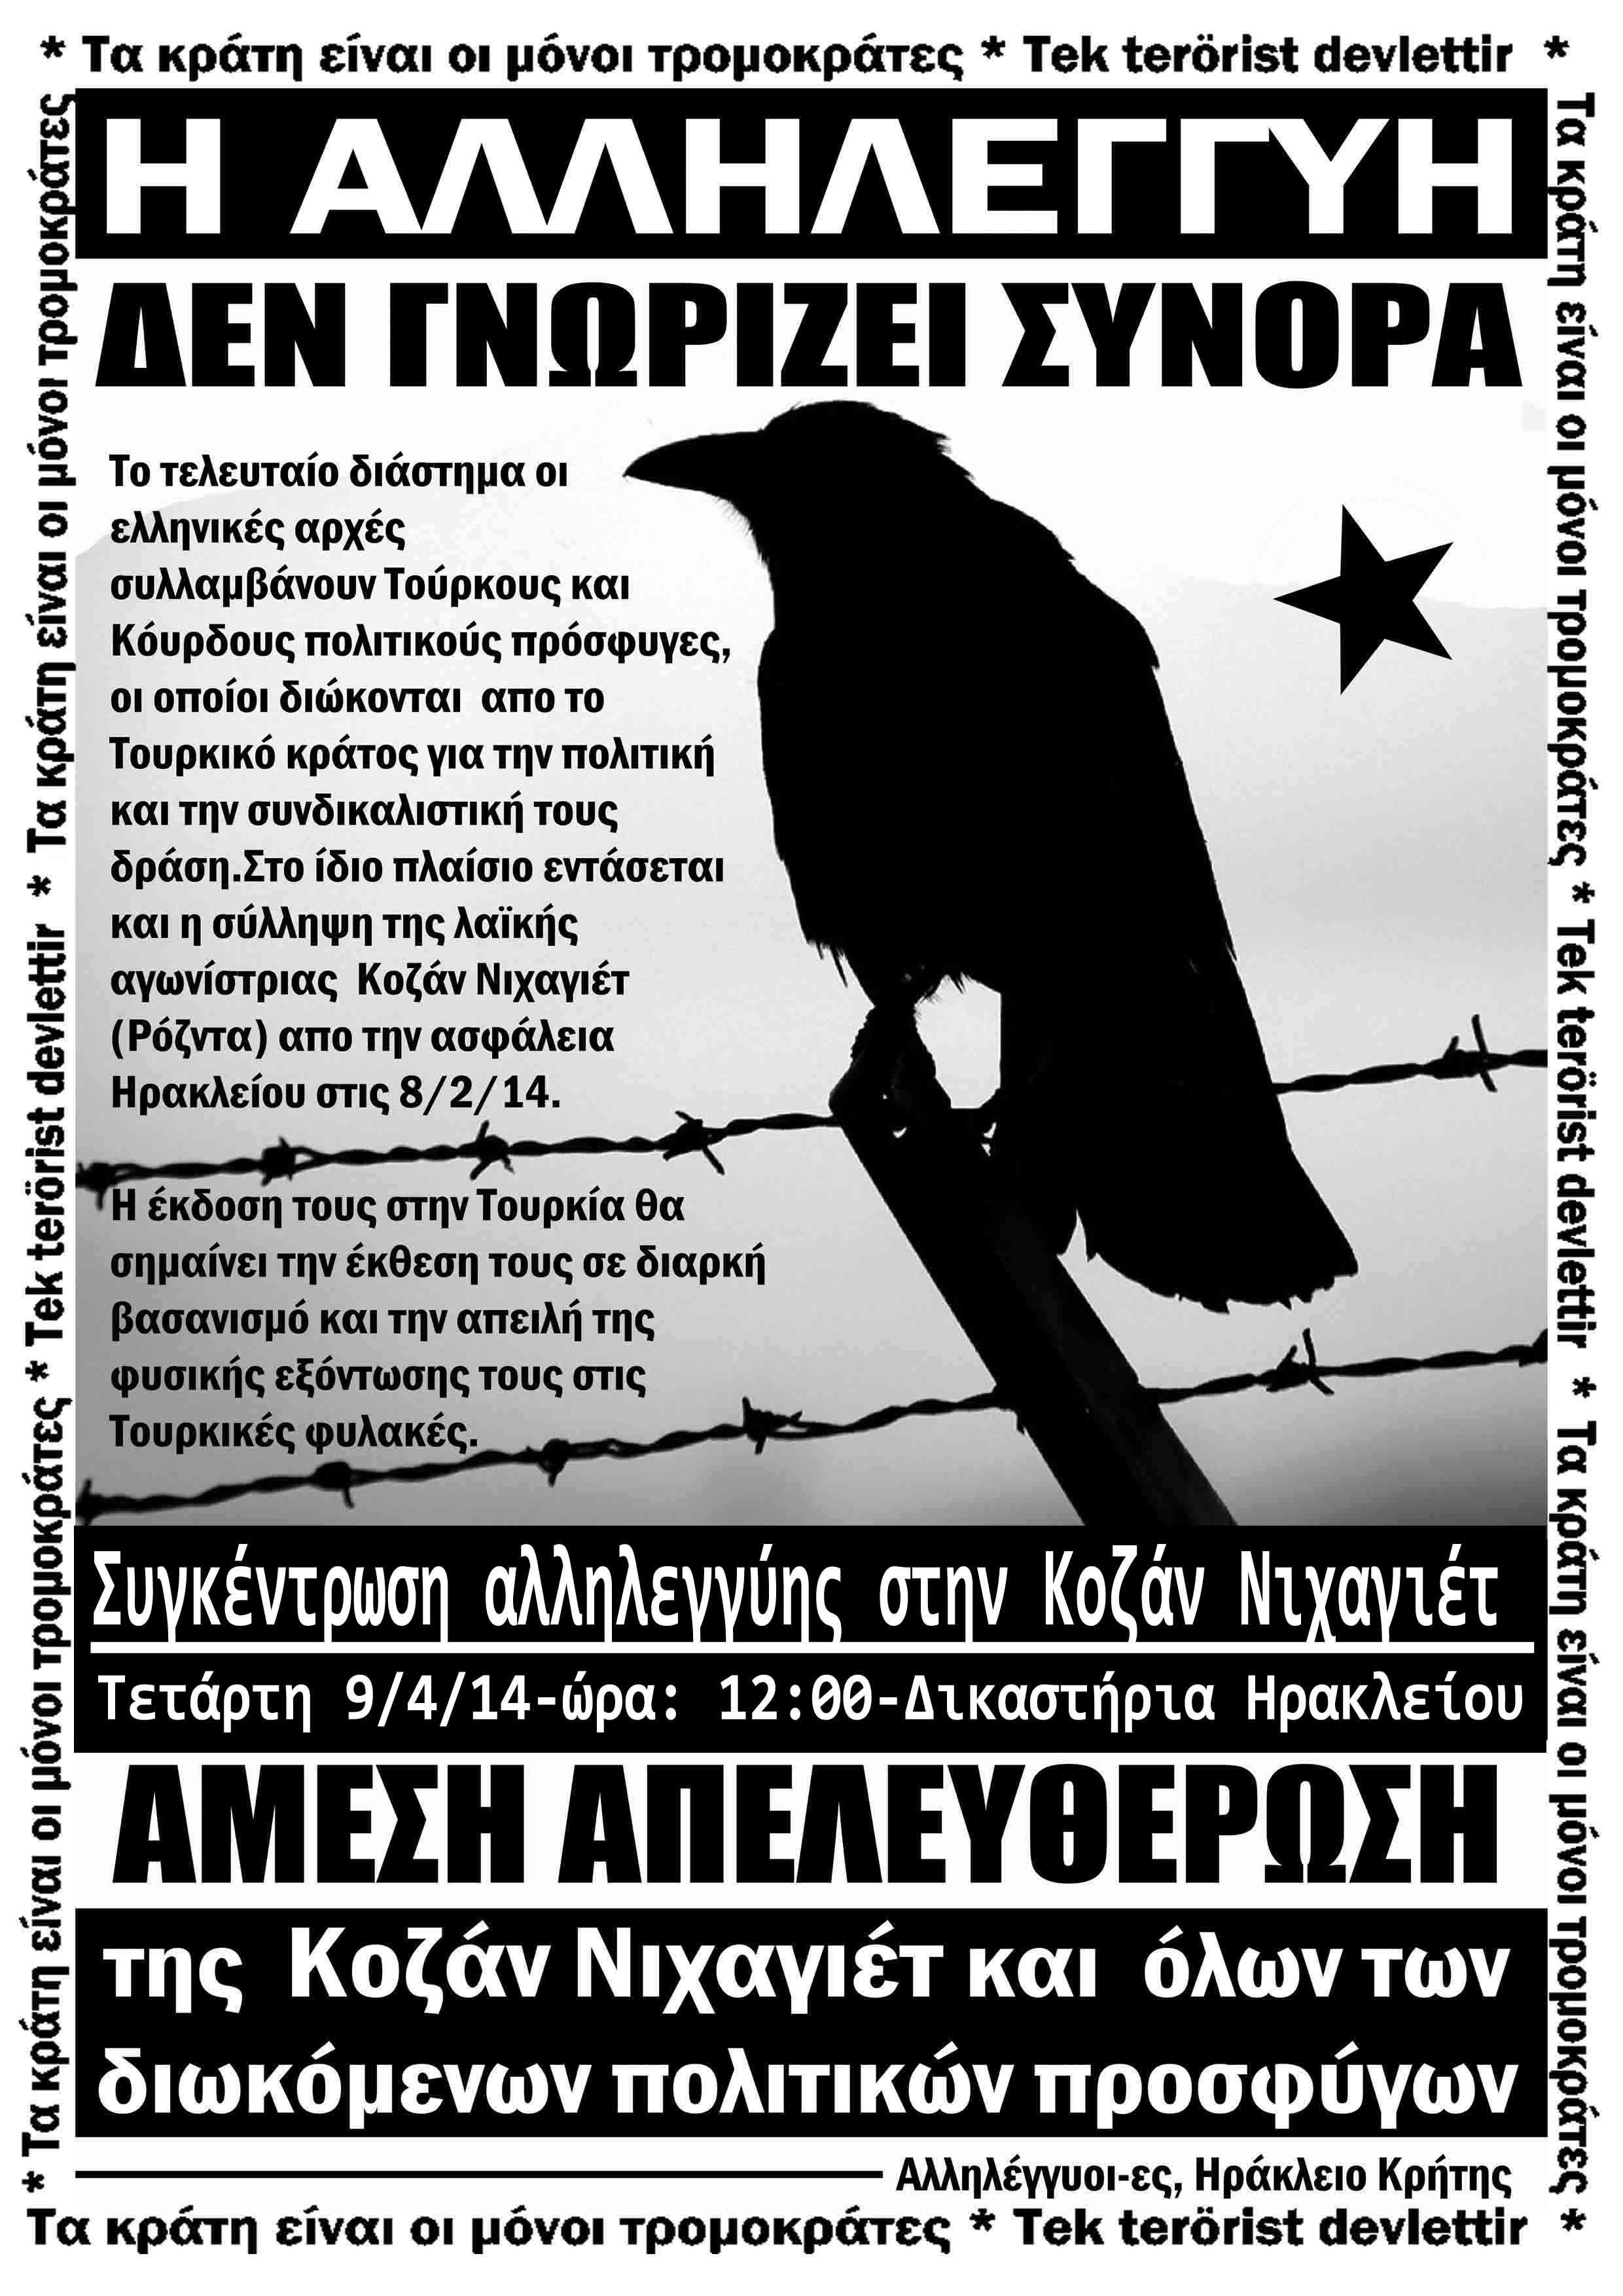 solidarity-_to-kozan-Nihagiet-9-4-14